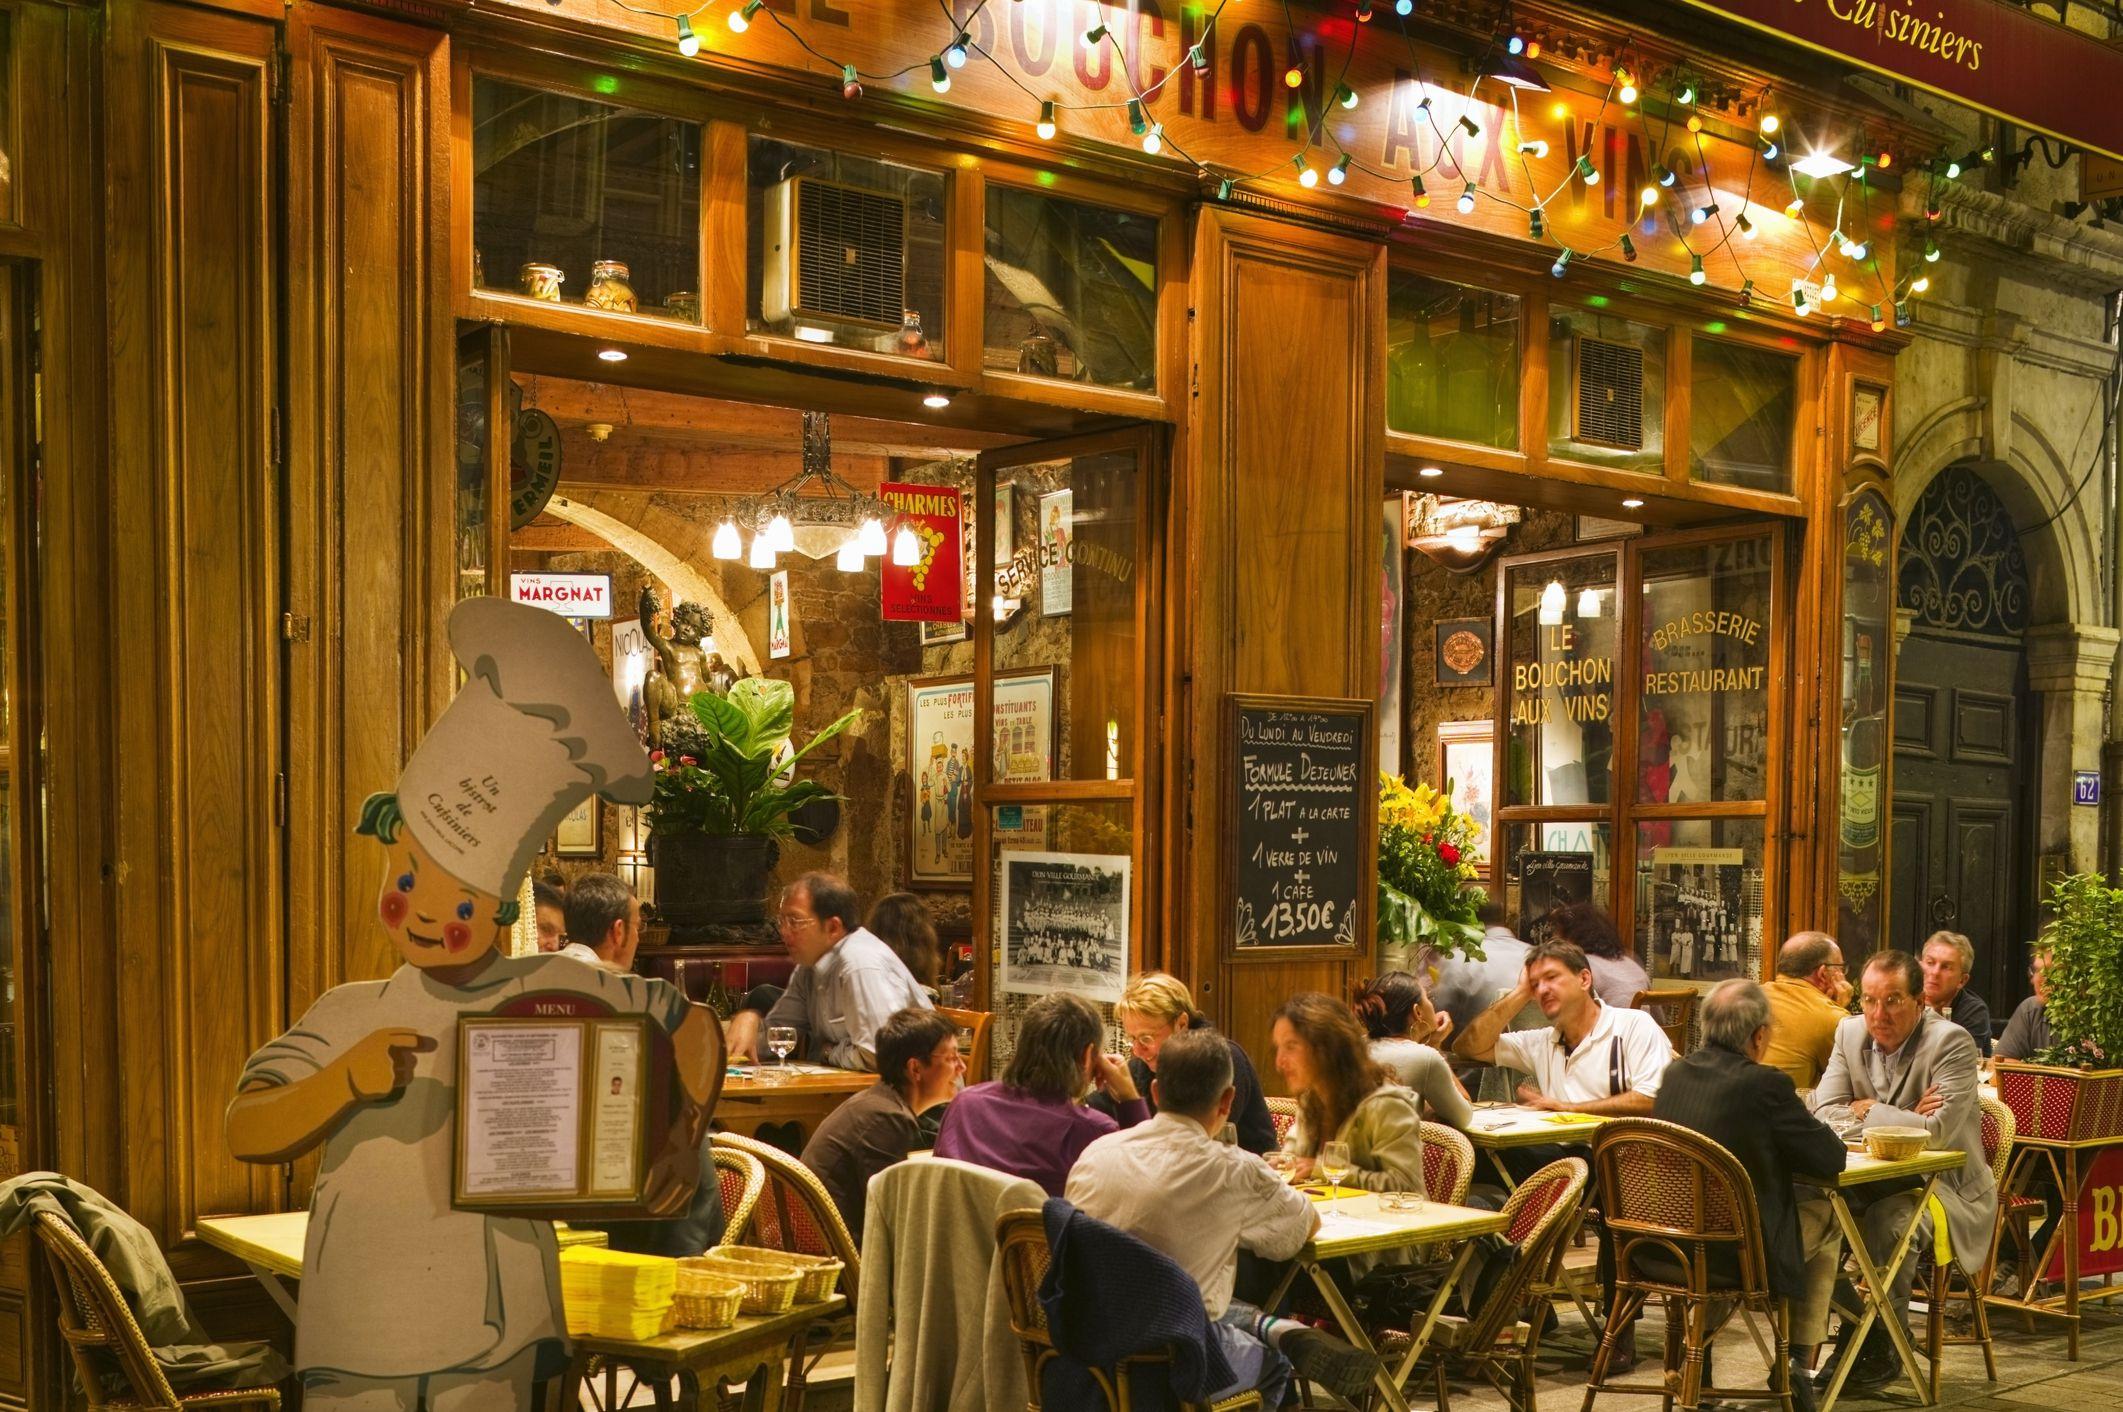 Gay restaurants in Lyon See more restaurants